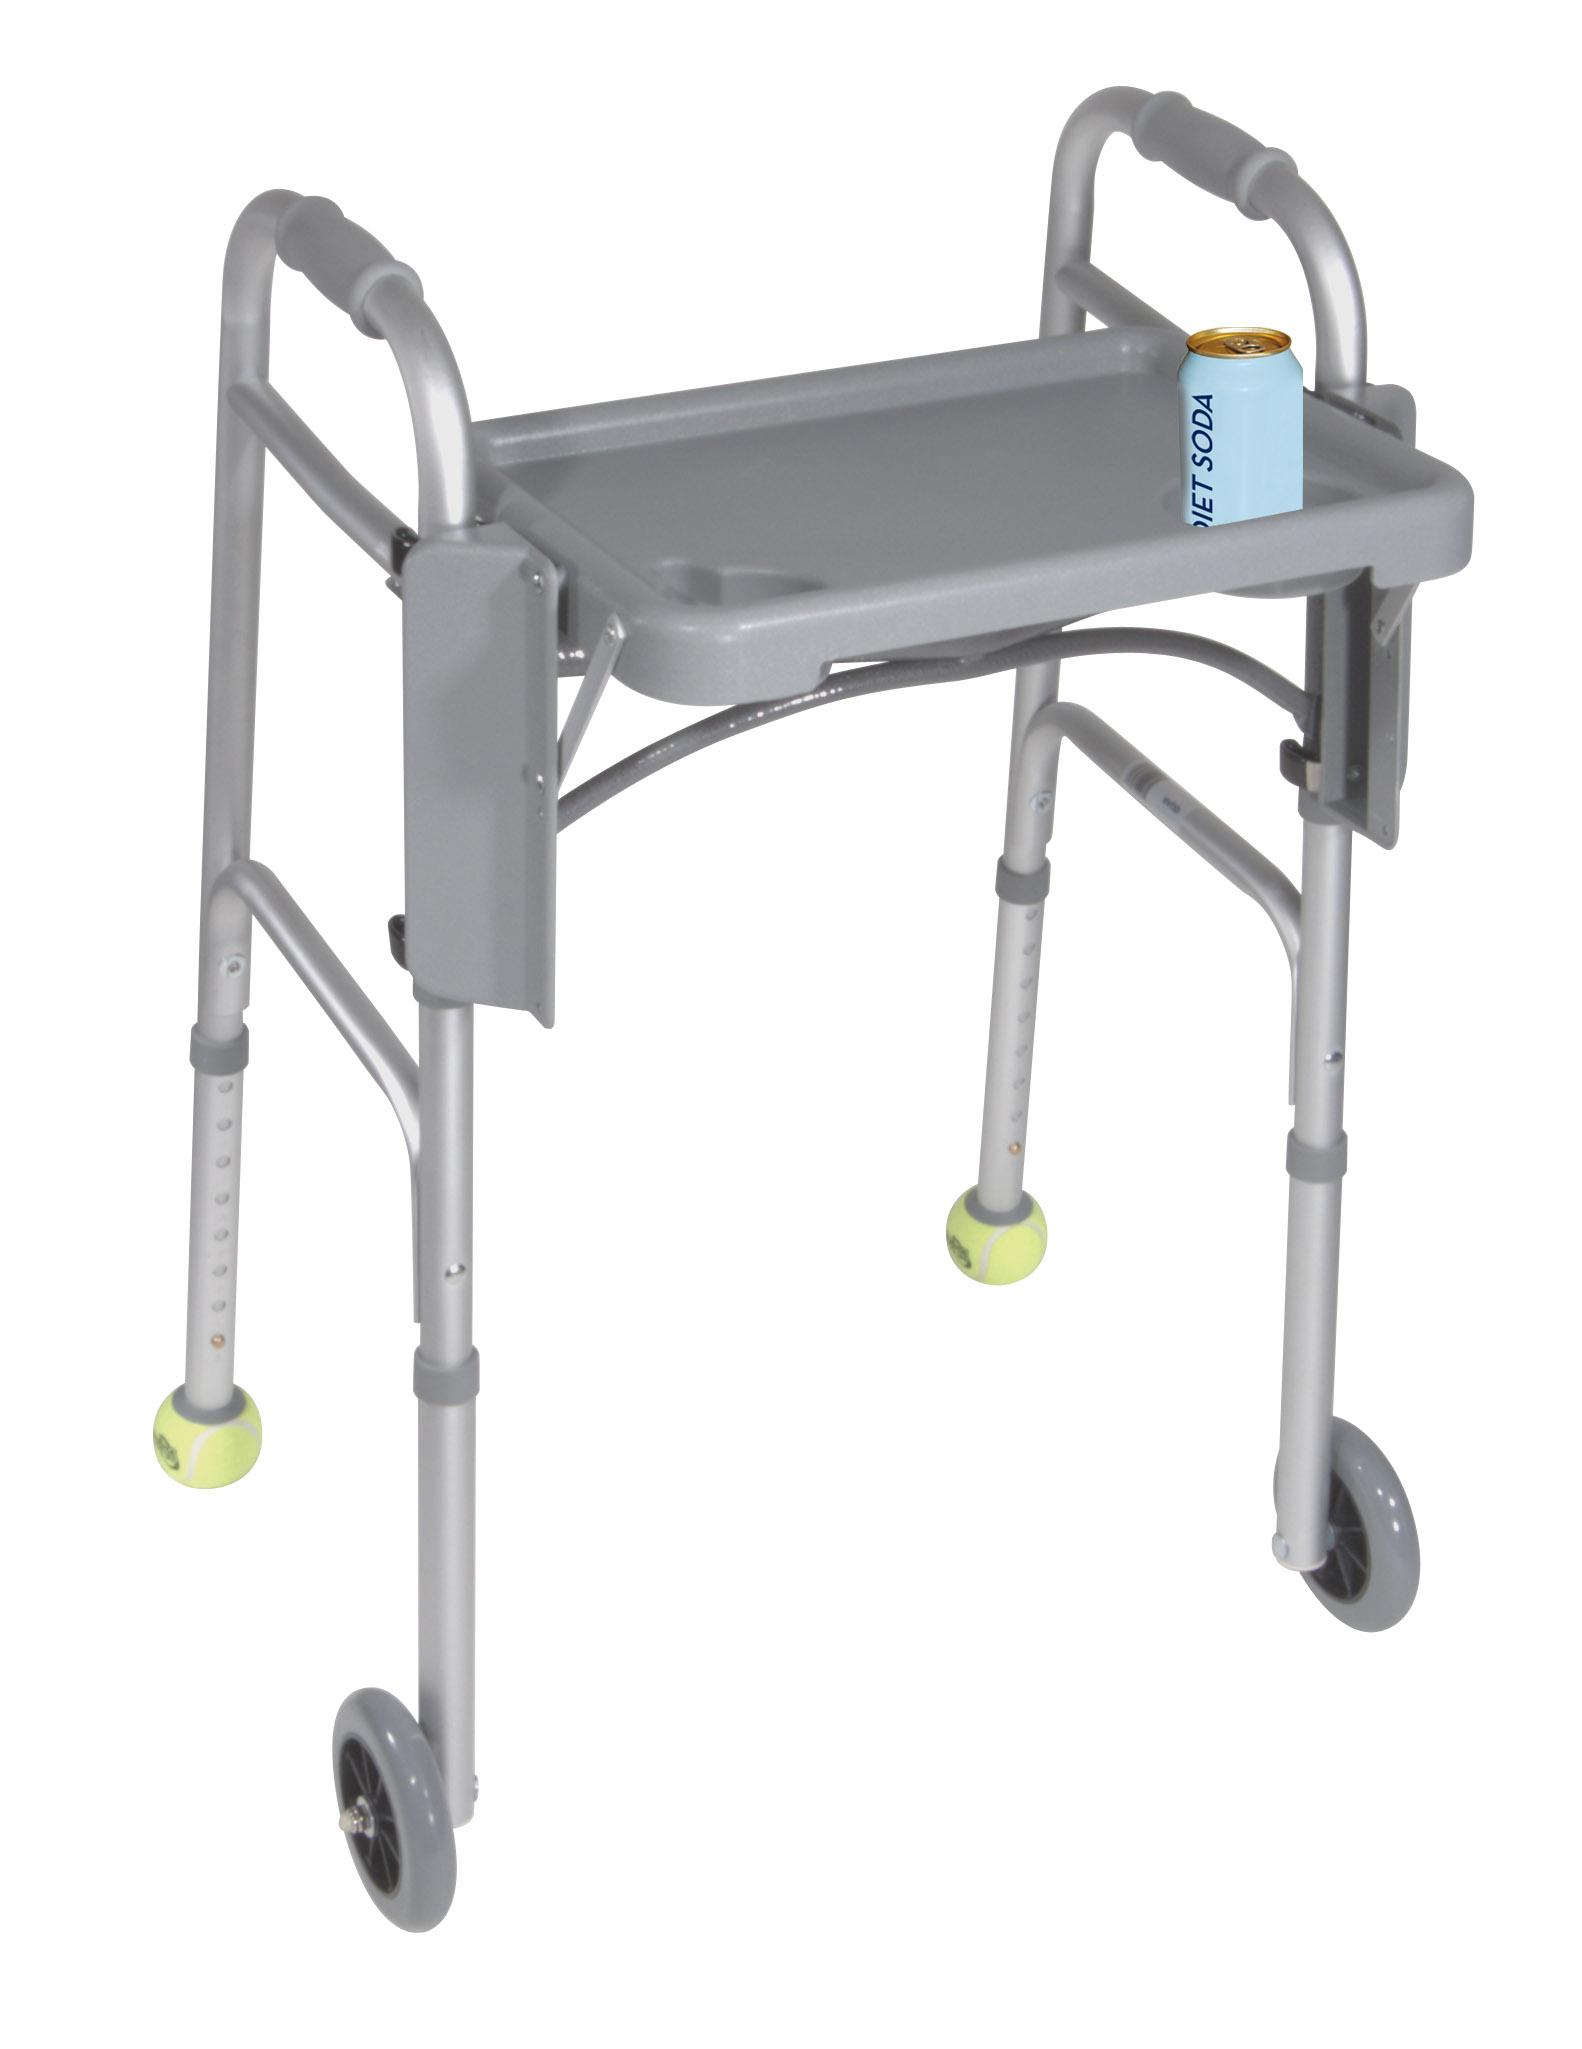 nursing chair walmart bruno lift accessories walker for elderly | joy studio design gallery - best